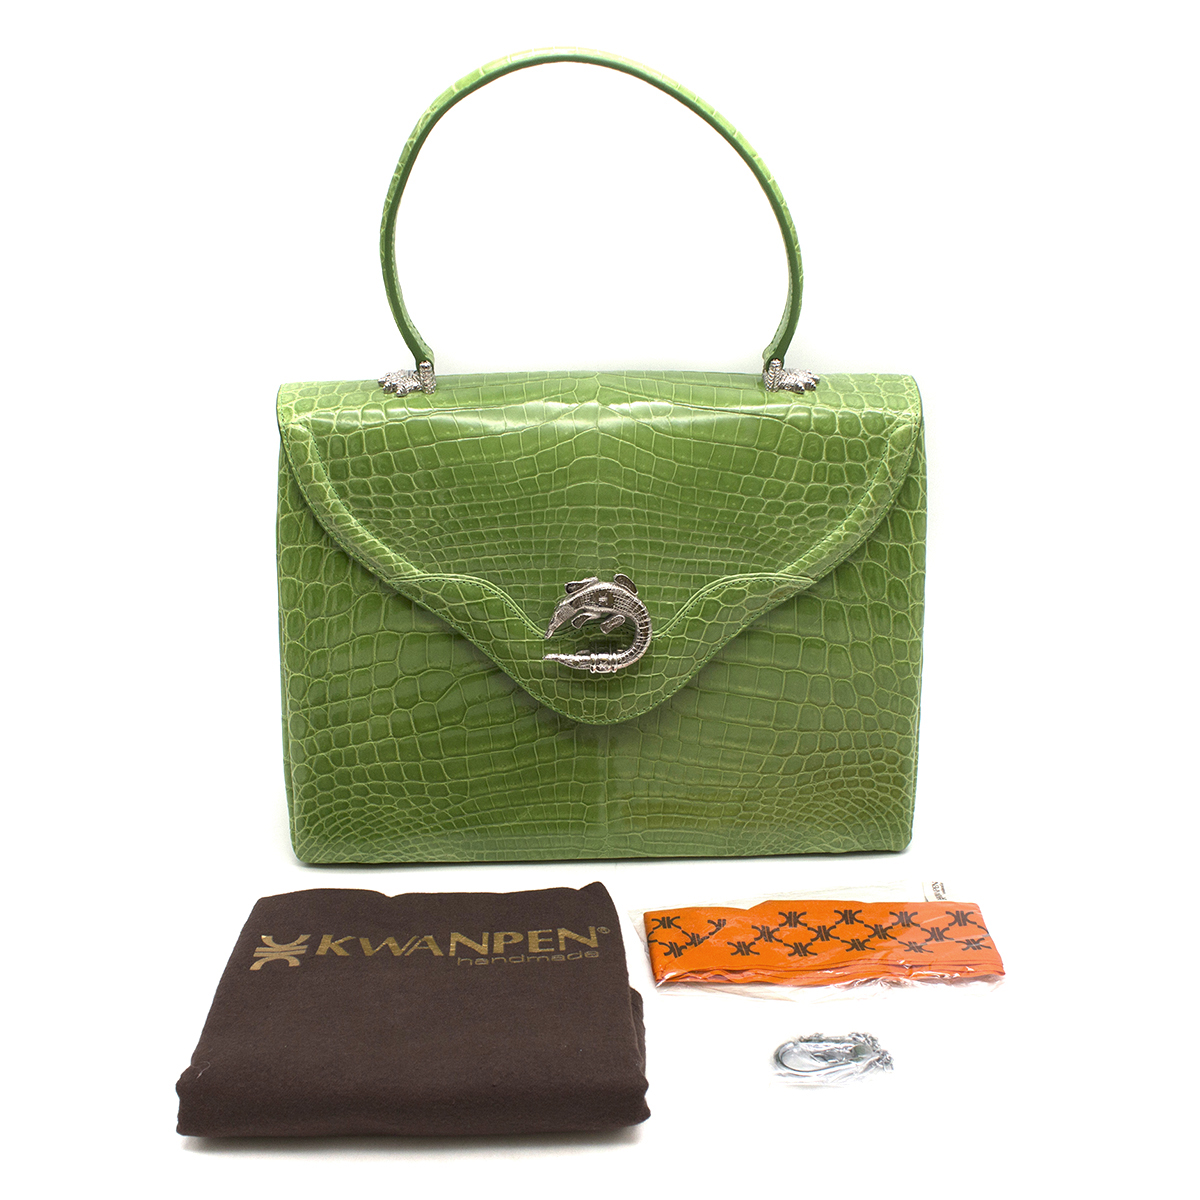 Kwanpen Green Crocodile Leather 5568 Signature Handbag